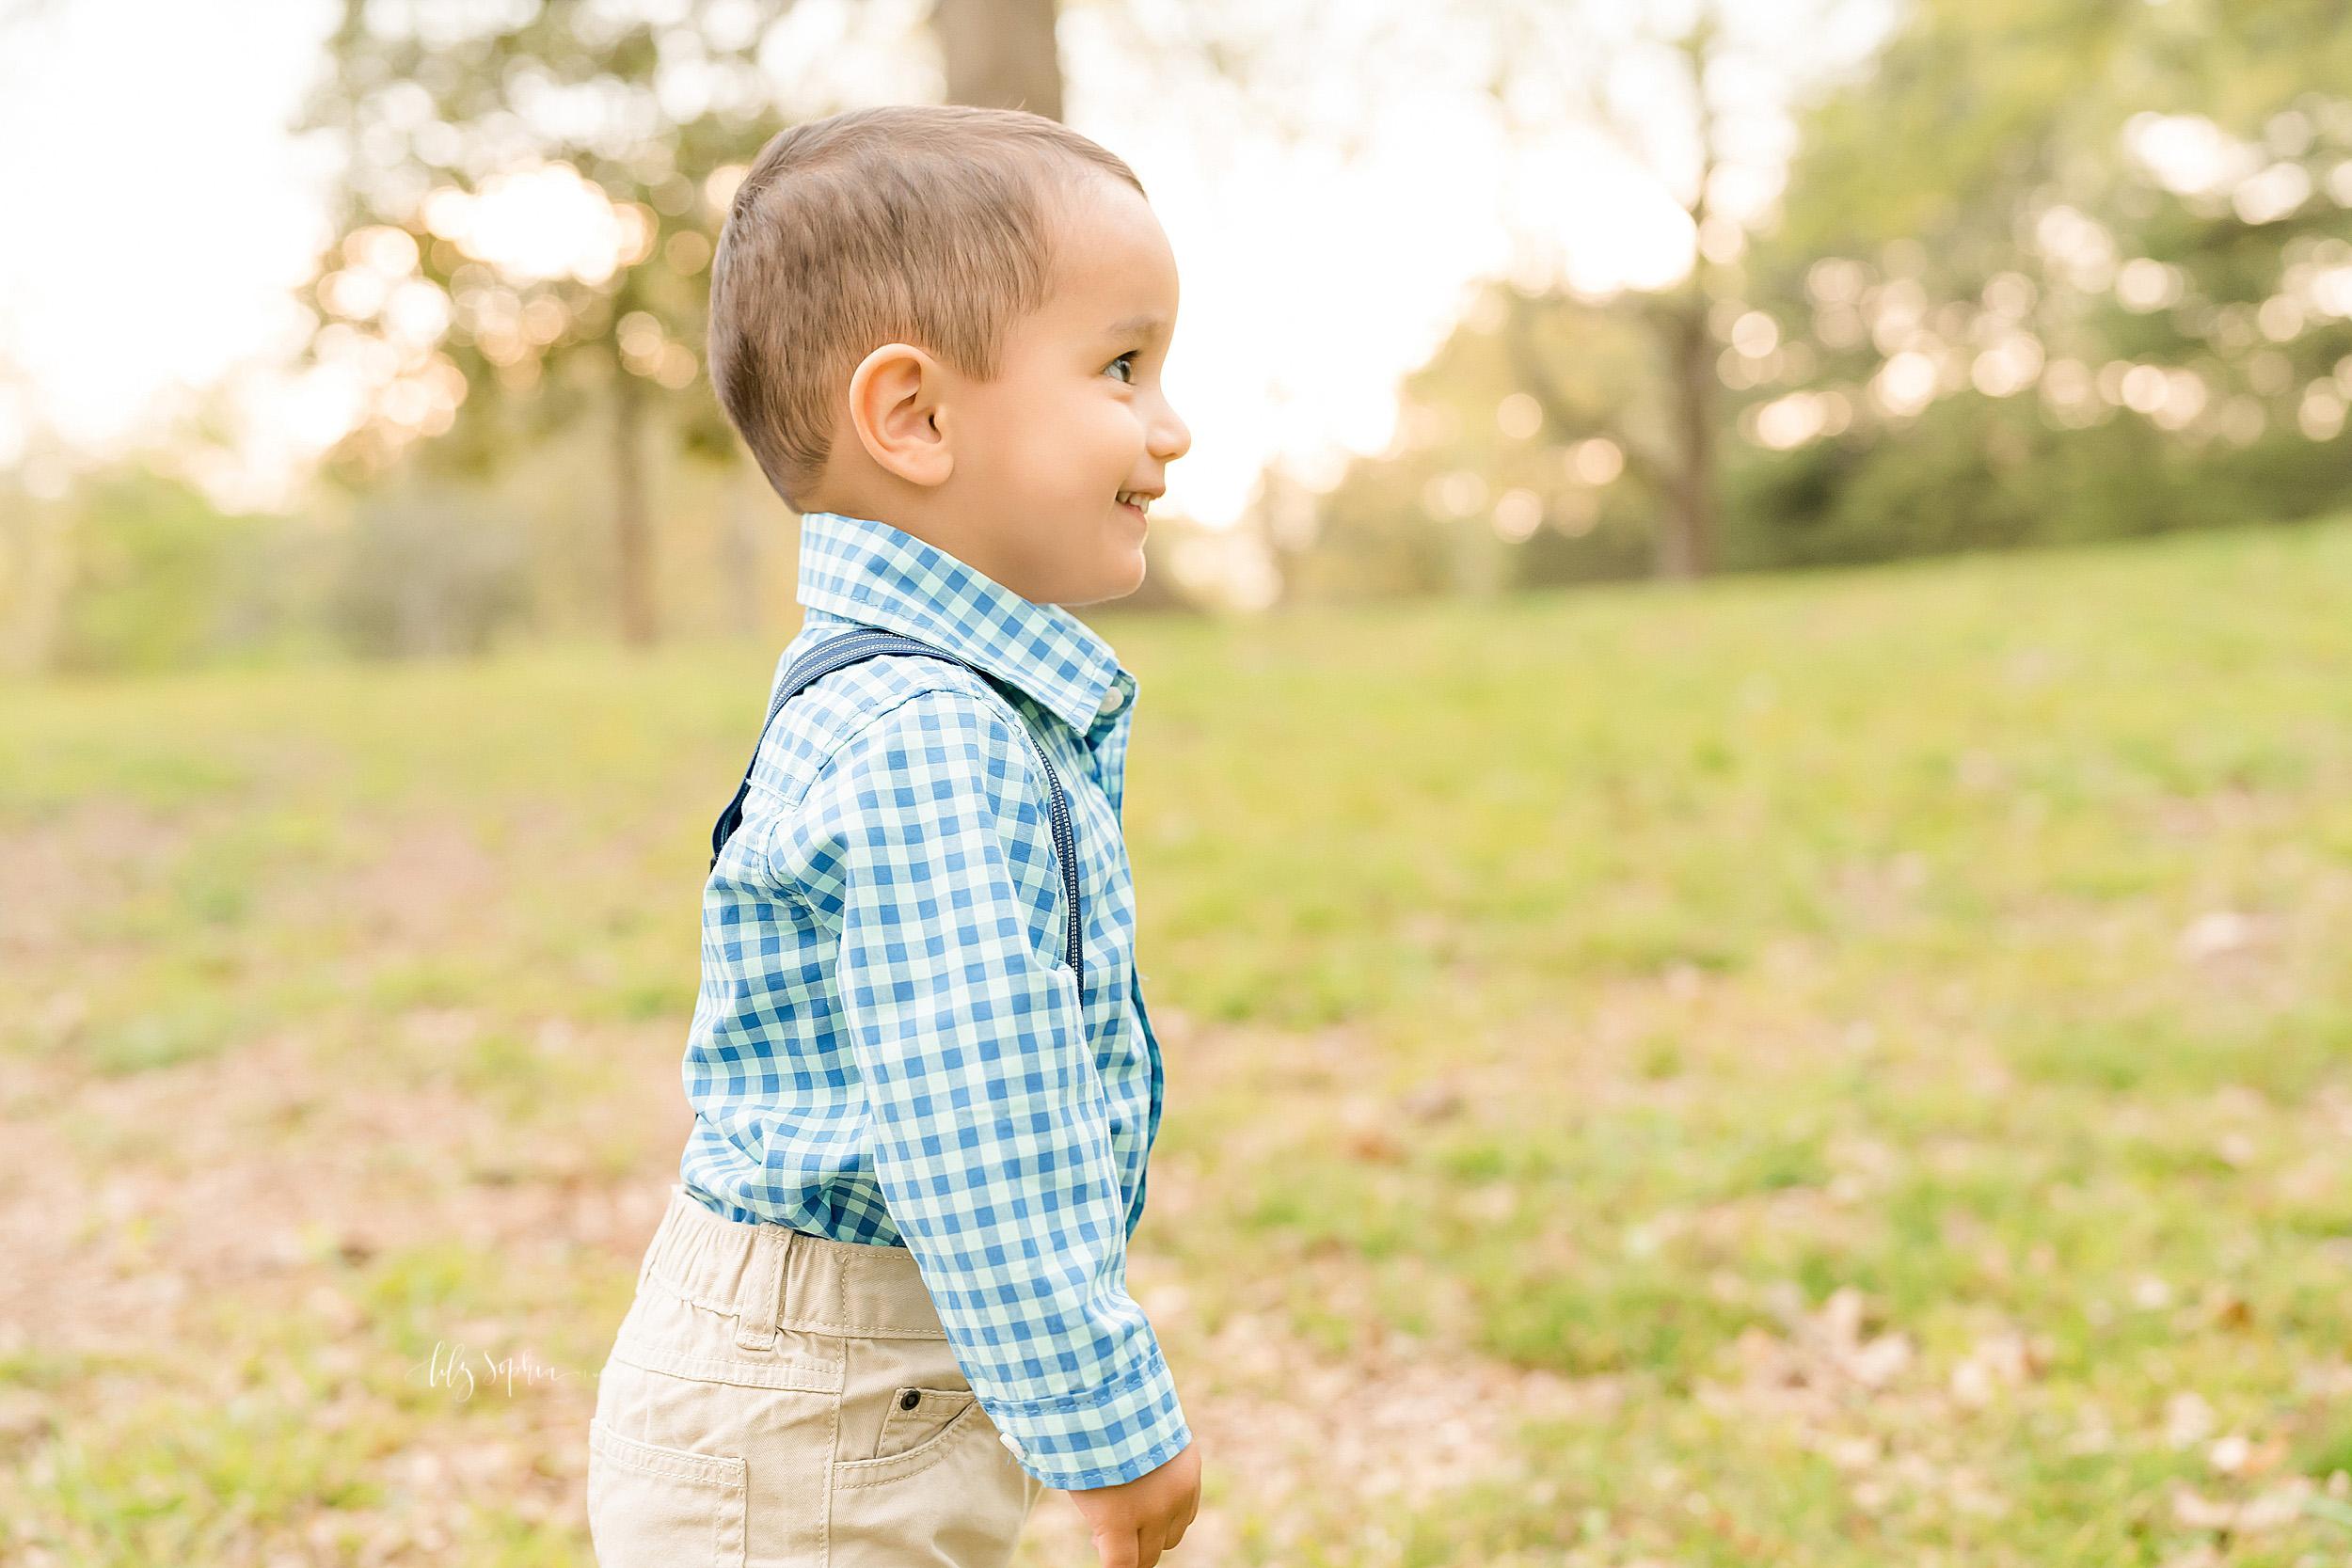 atlanta-covington-sandy-springs-buckhead-virginia-highlands-west-end-decatur-lily-sophia-photography-second-birthday-toddler-boy-two-outdoor-family-photos_0979.jpg